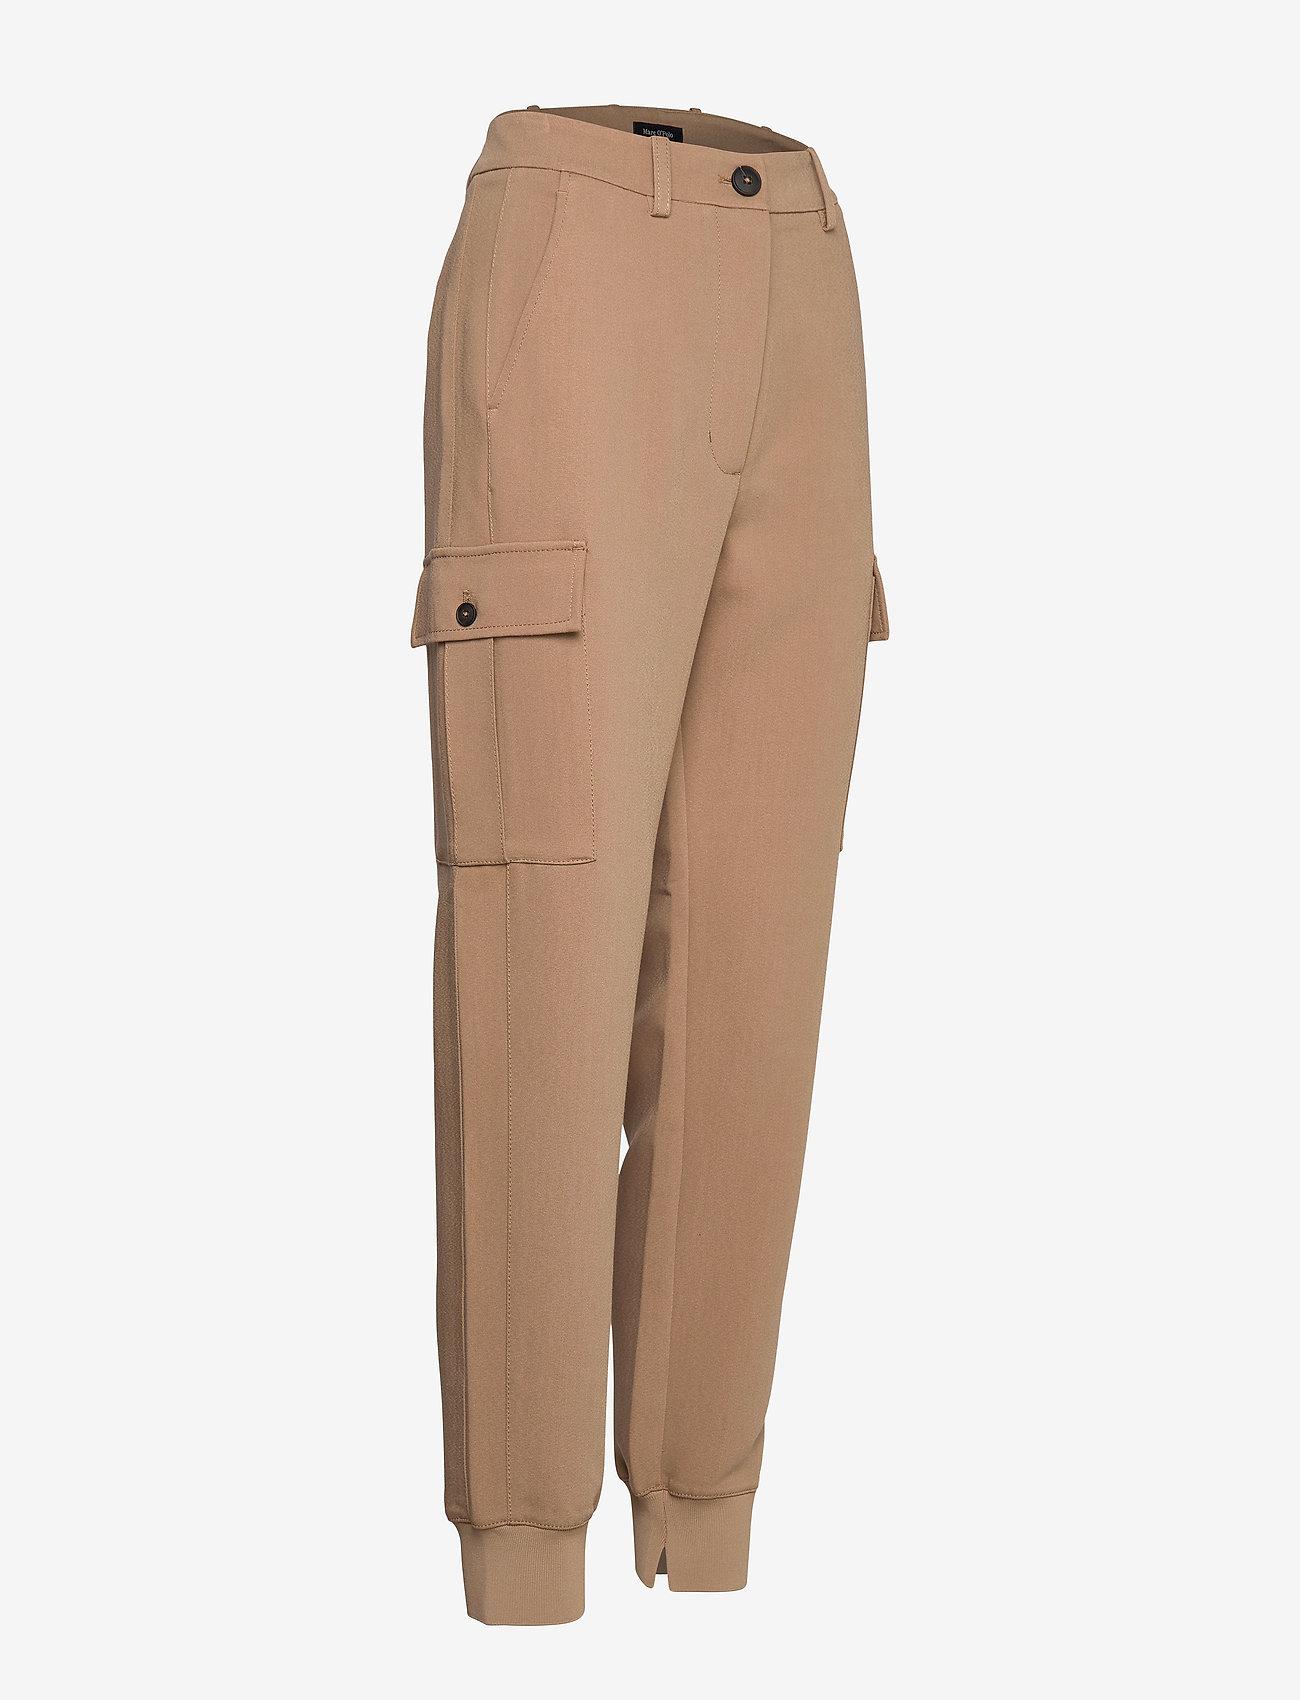 Woven Pants (Mild Tobacco) (1201.85 kr) - Marc O'Polo